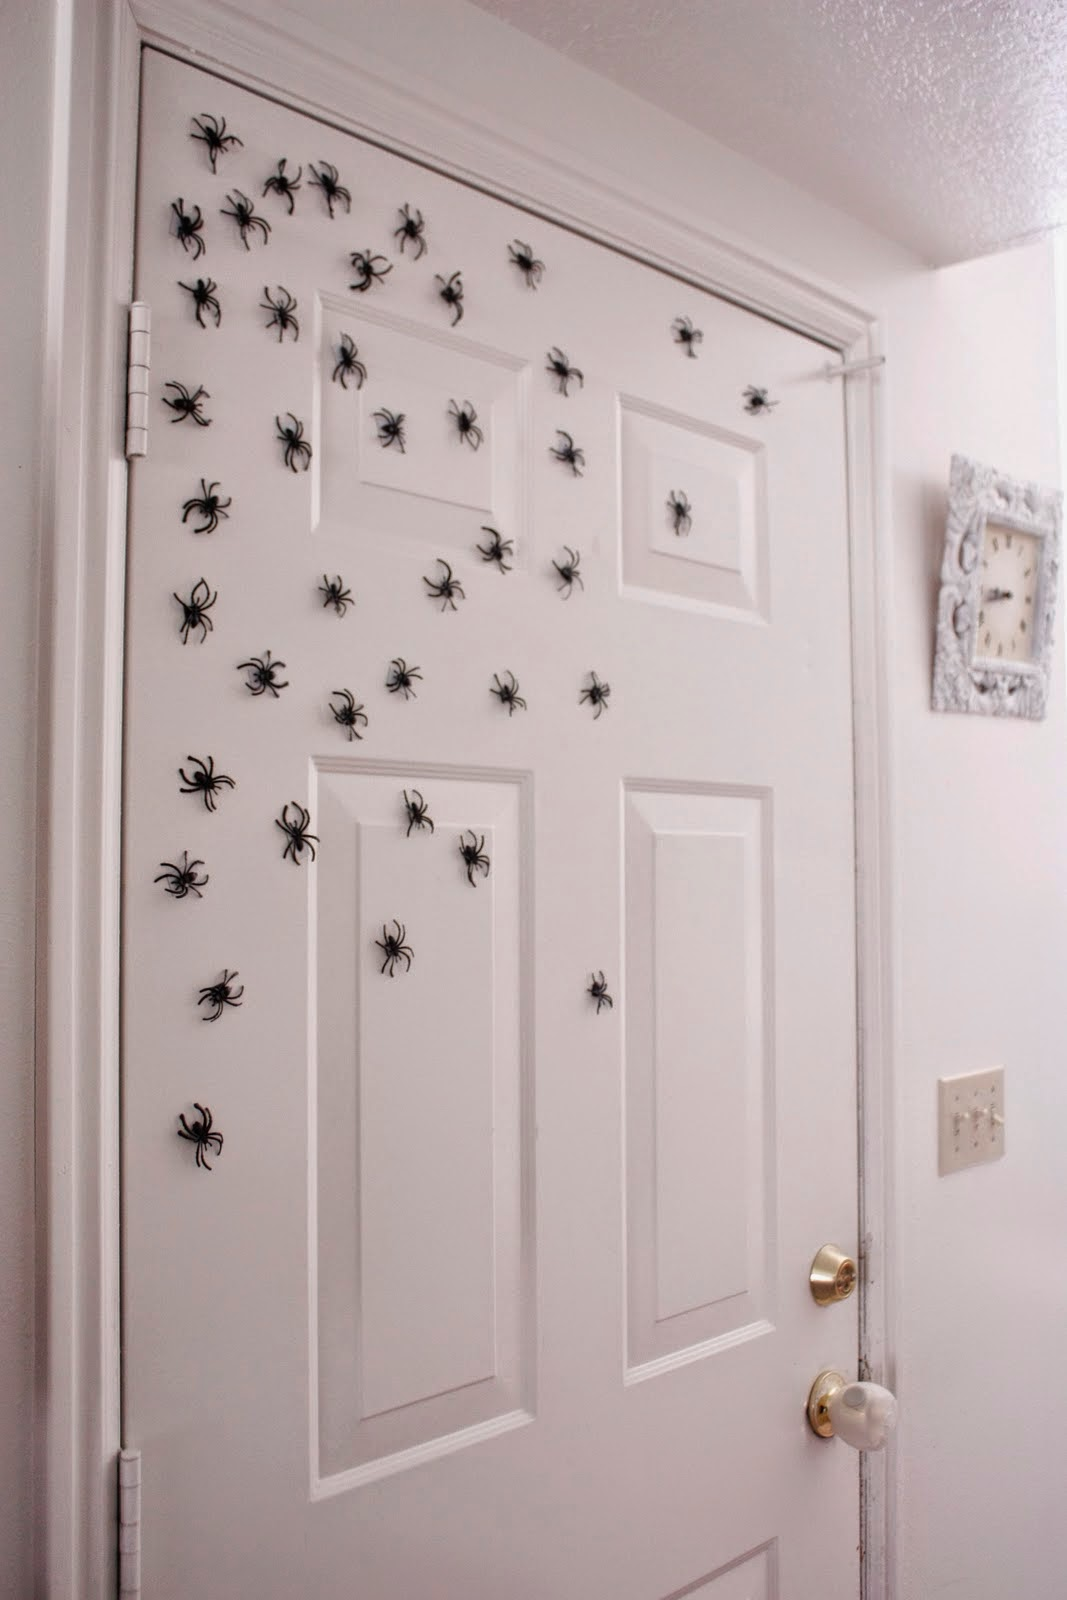 10 ideas decorativas para halloween decoraci n retro for Ideas decorativas economicas